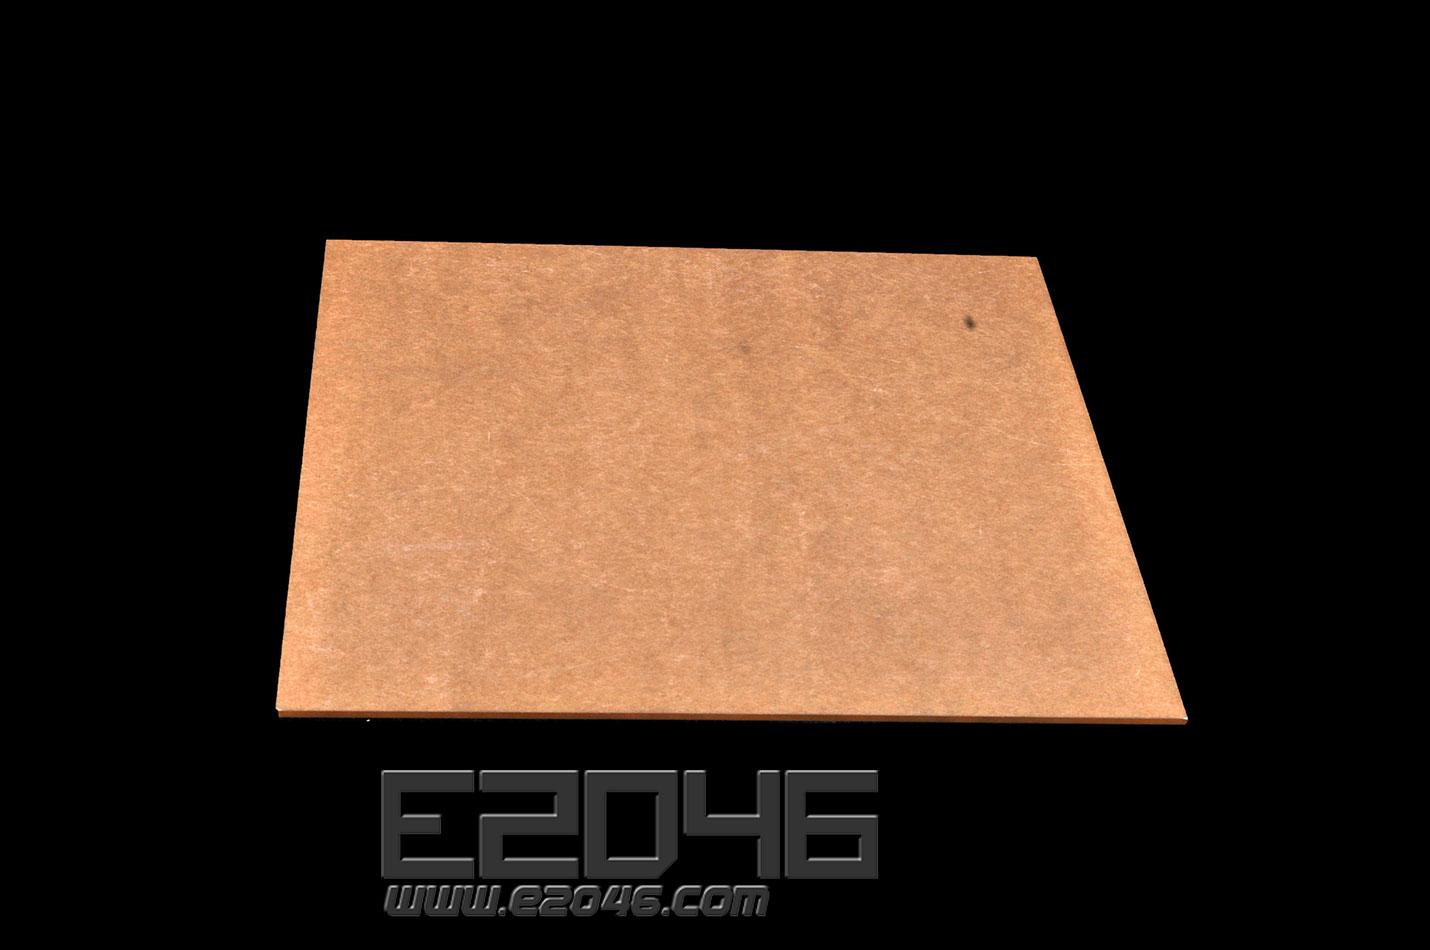 L24 Transparent Square Acrylic Display Base